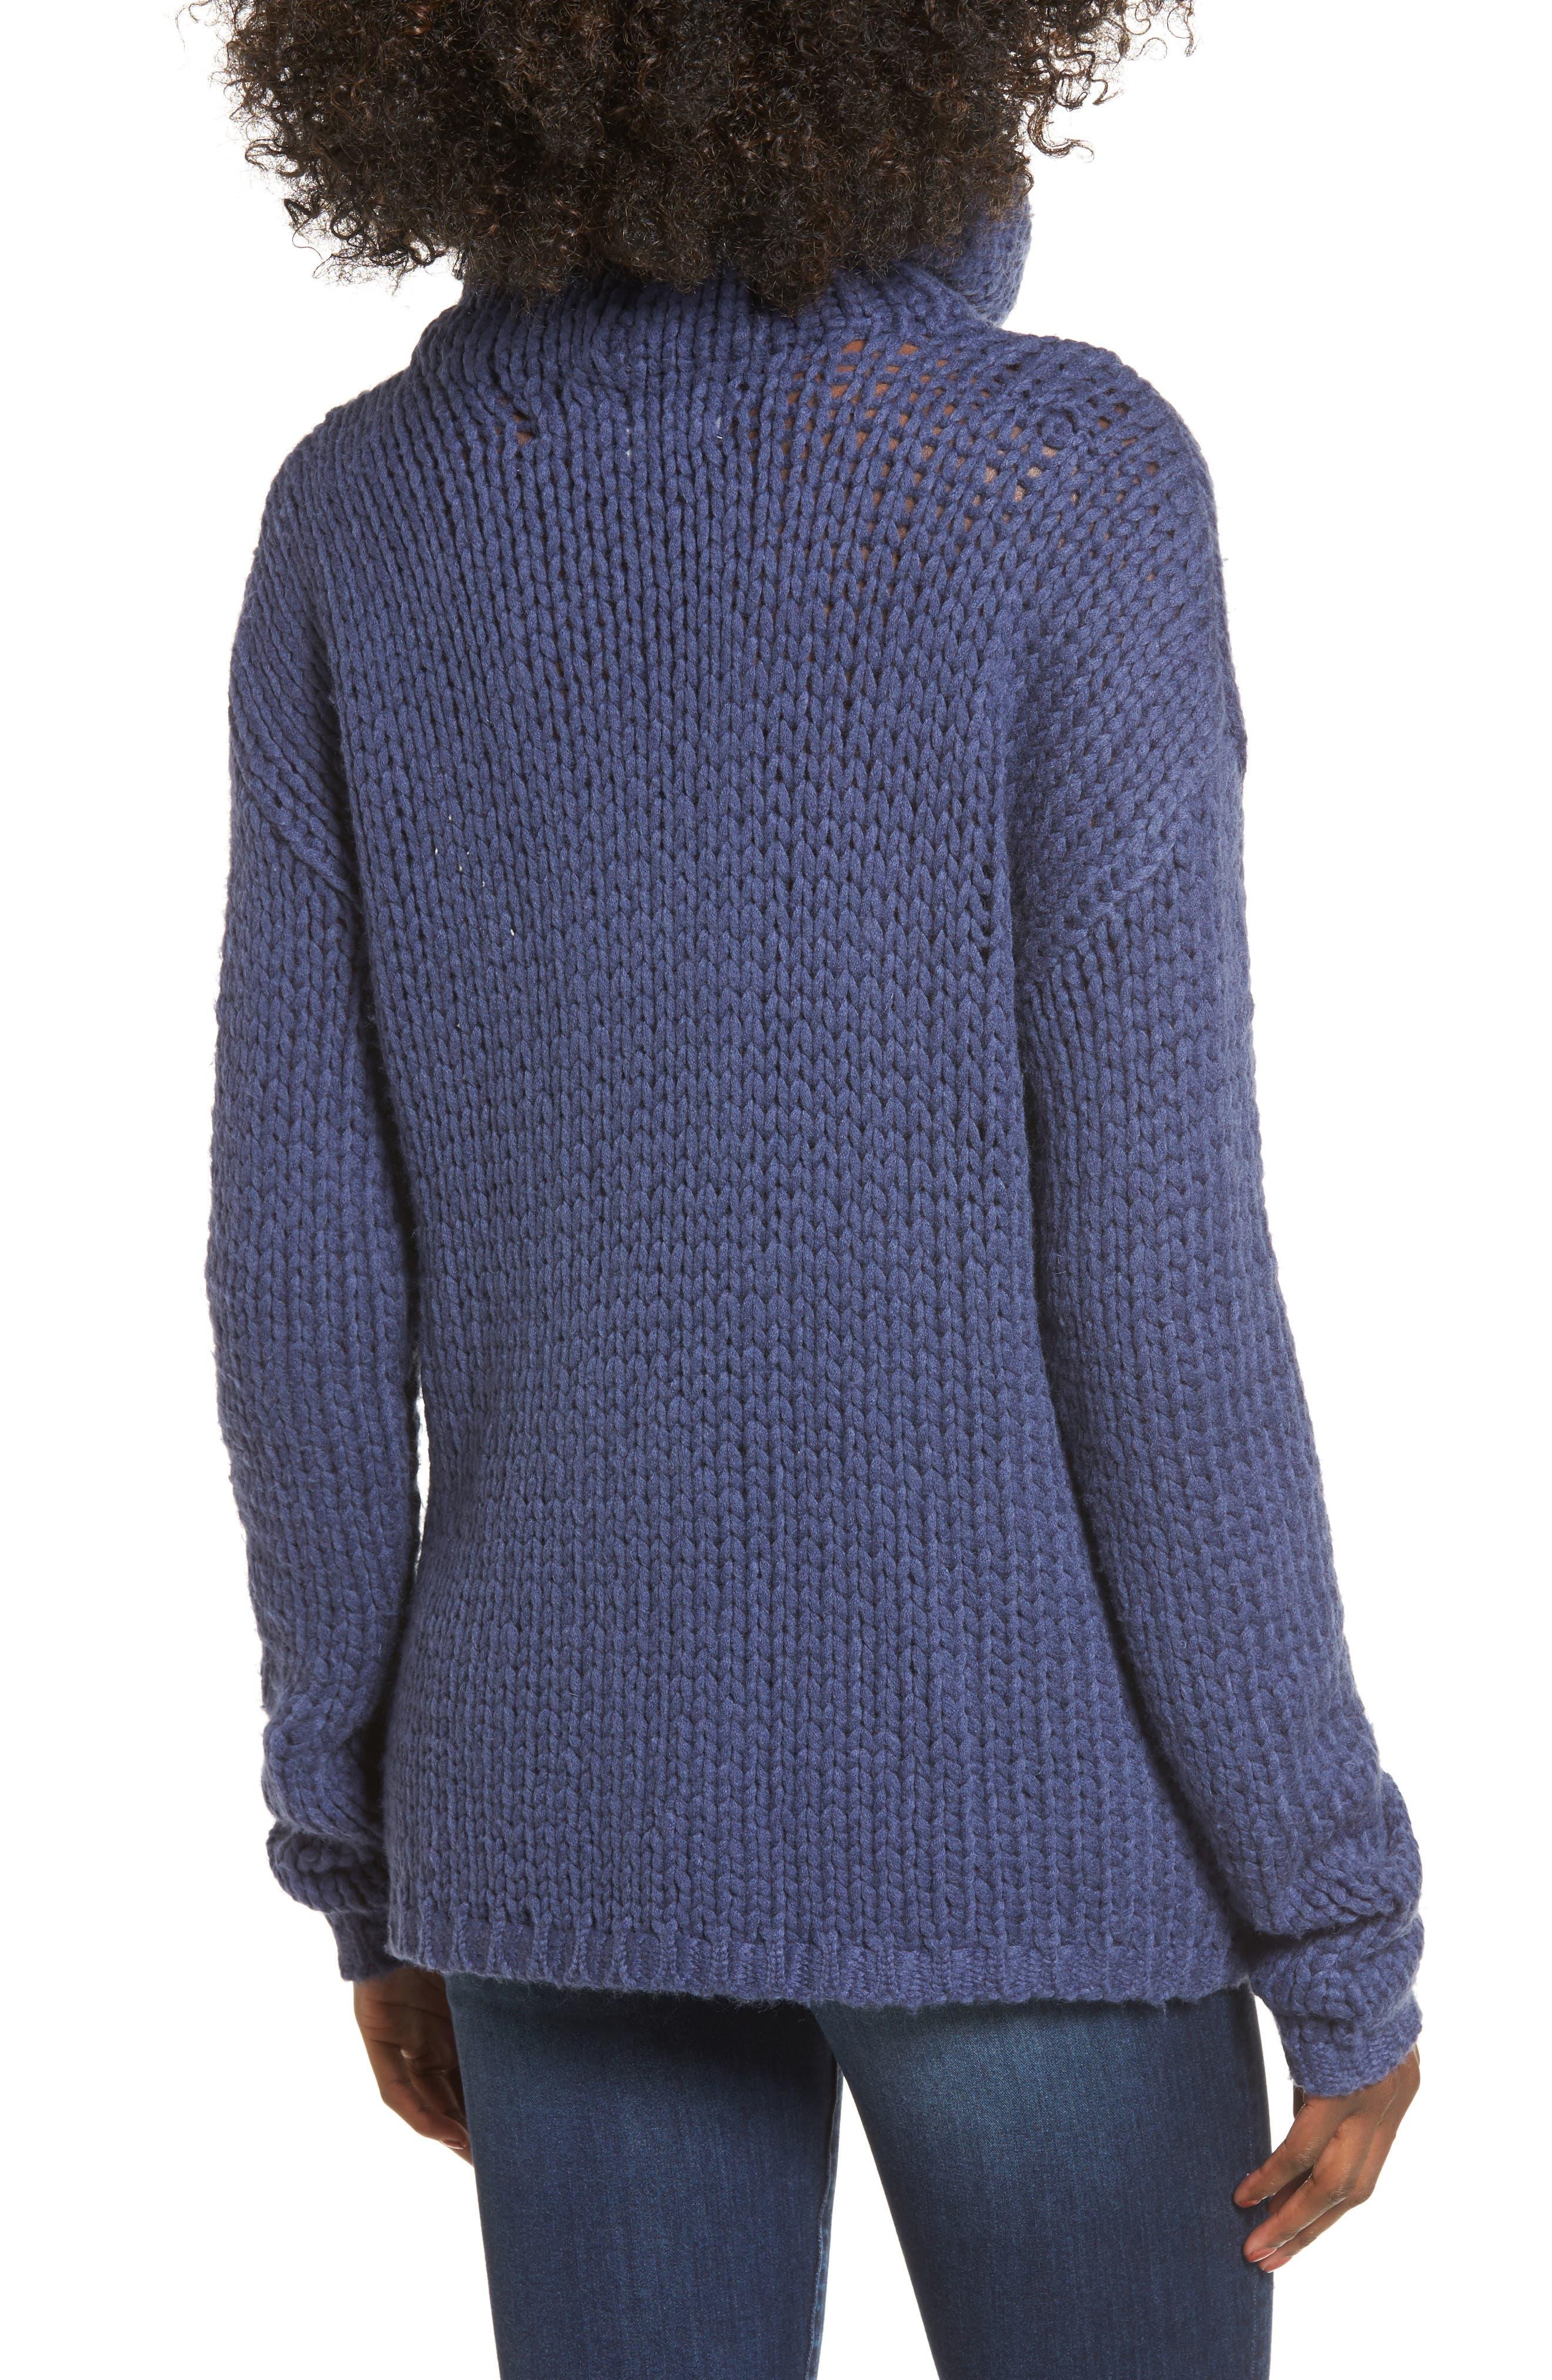 Hawken Turtleneck Sweater,                             Alternate thumbnail 2, color,                             400